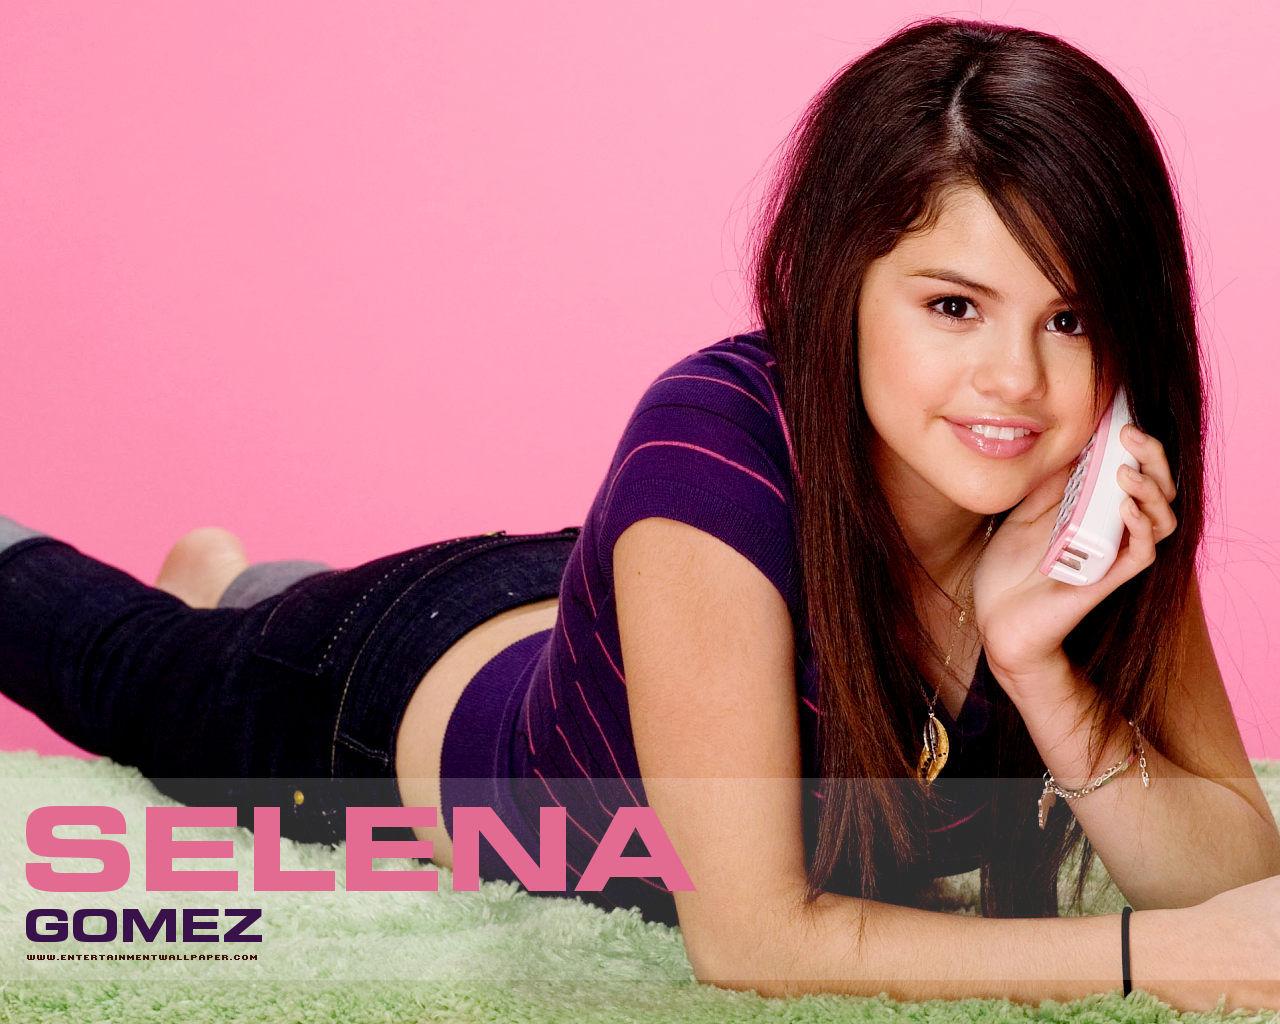 Perk News Selena Gomez 2012 Wallpaper 1280x1024